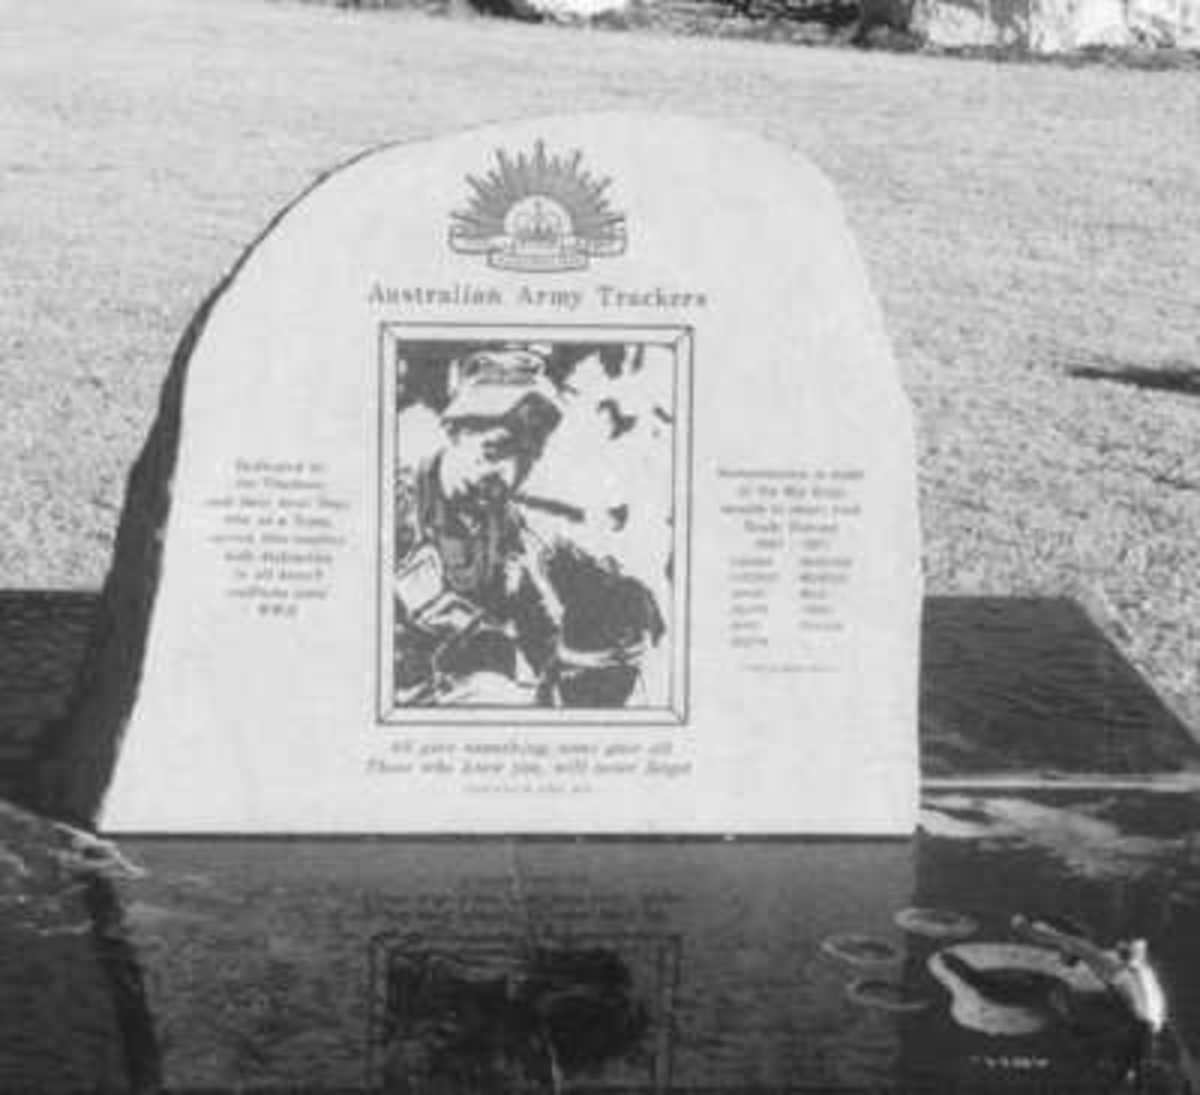 The Australian Army Trackers Memorial, Goolwa, South Australia.